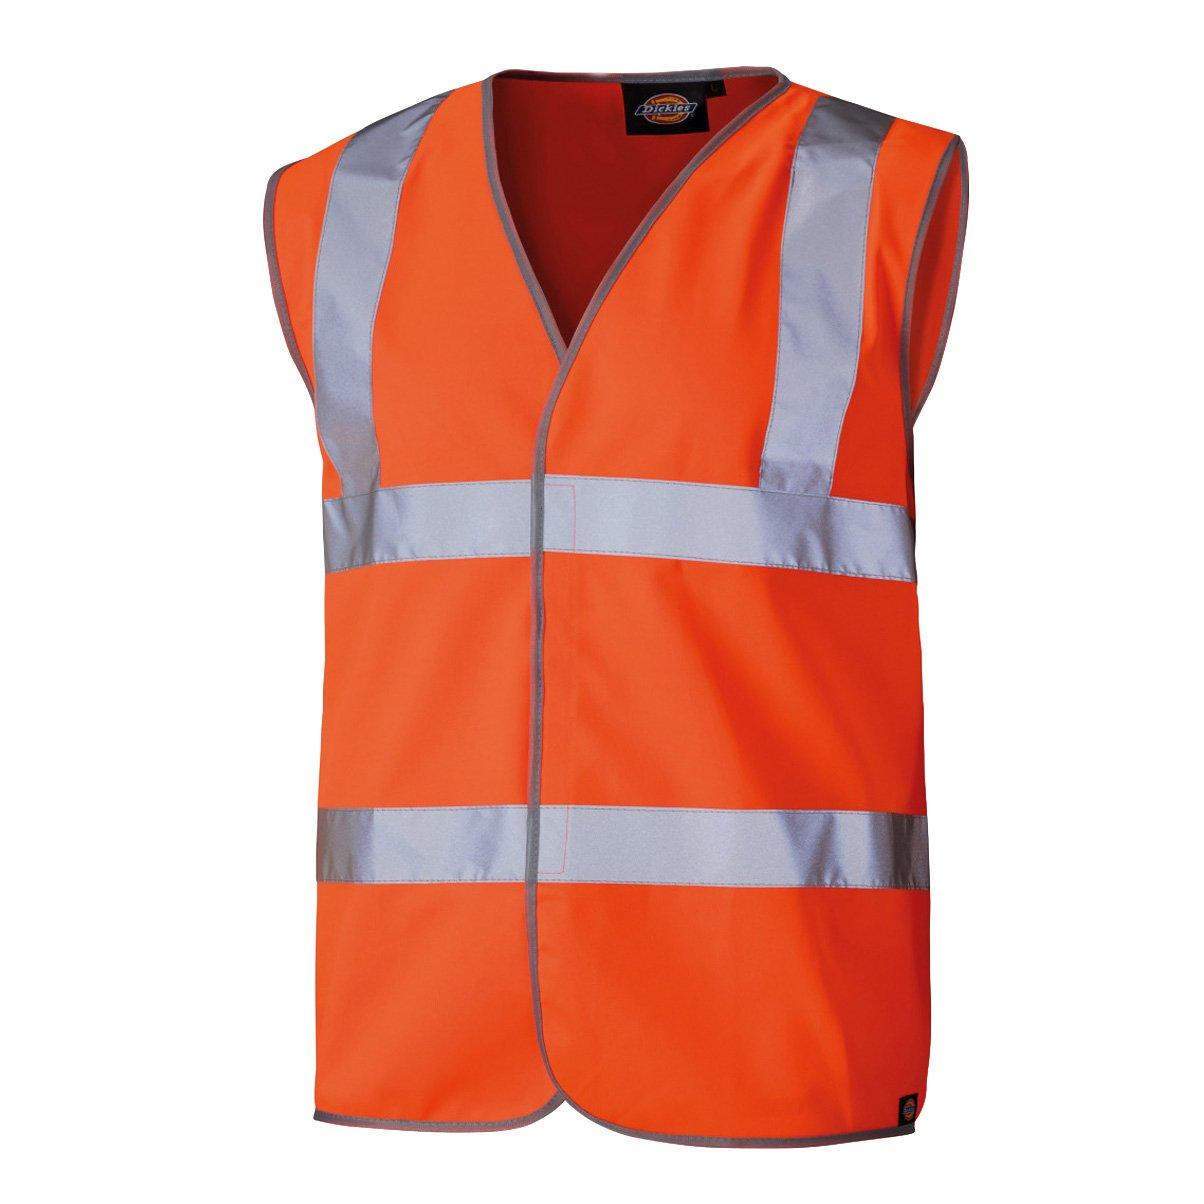 Dickies Sicherheitsweste mit Klettverschluss gelb AA XXL, SA22010 SA22010 AA XXL